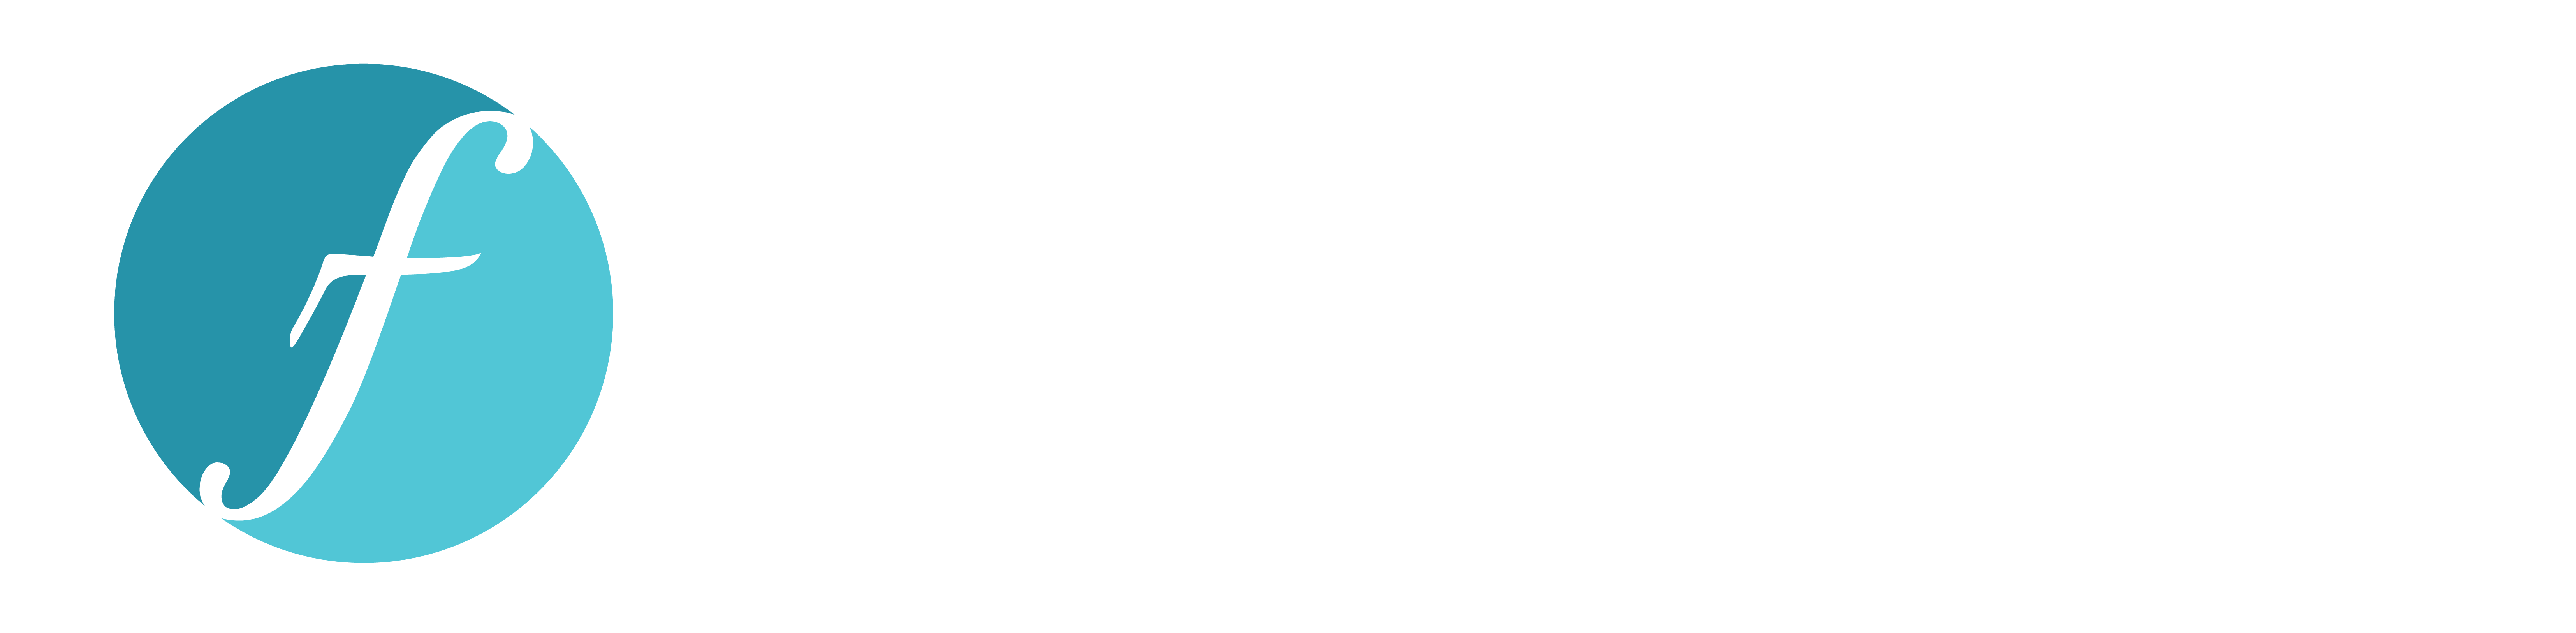 felicity brigham visual design